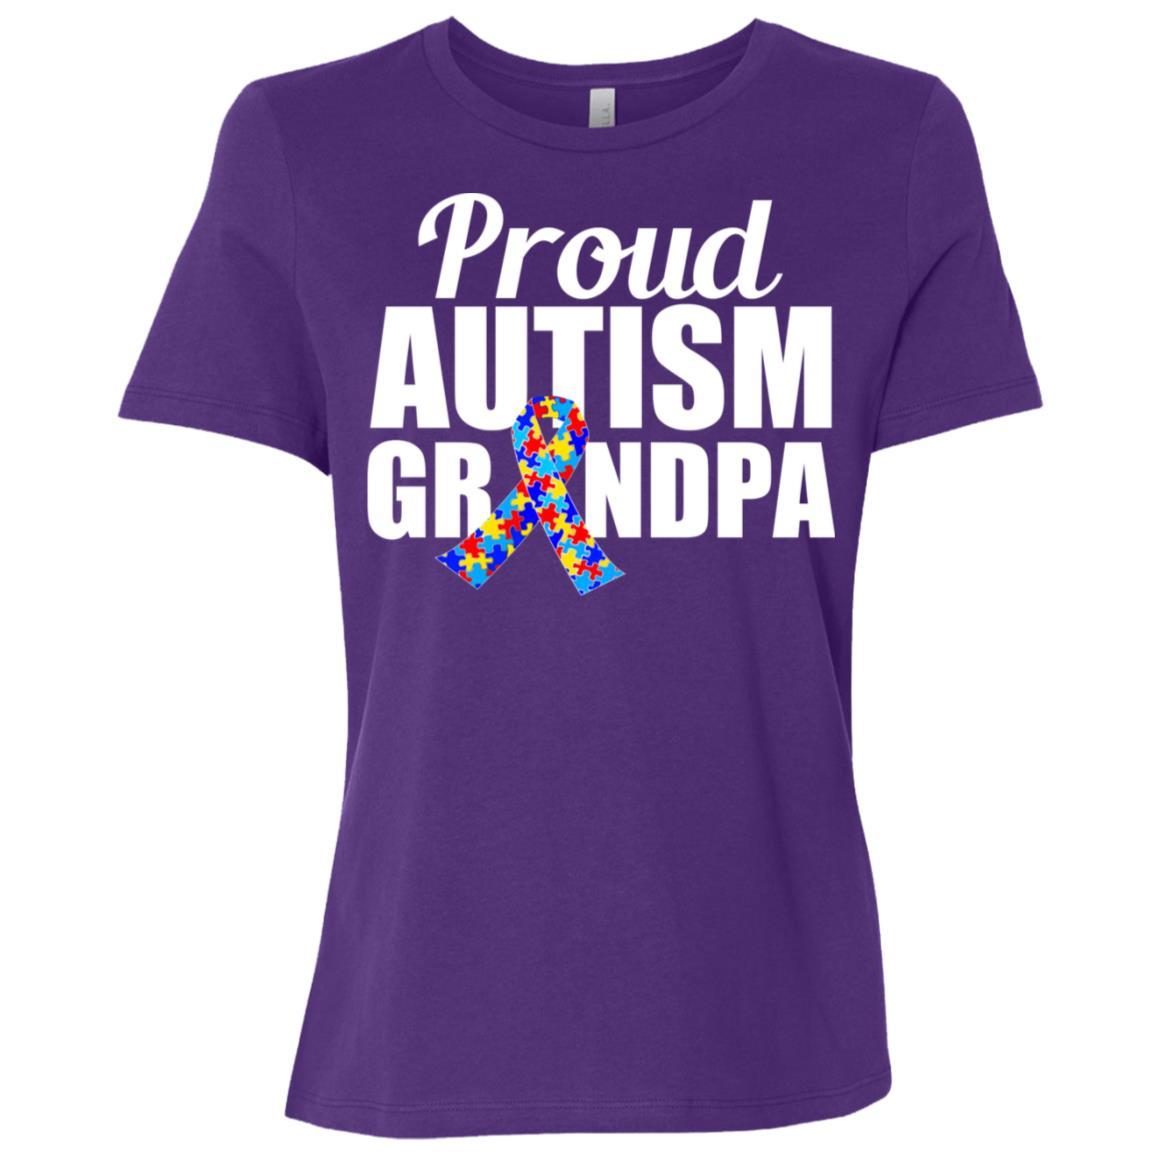 Proud Autism Grandpa Women Short Sleeve T-Shirt